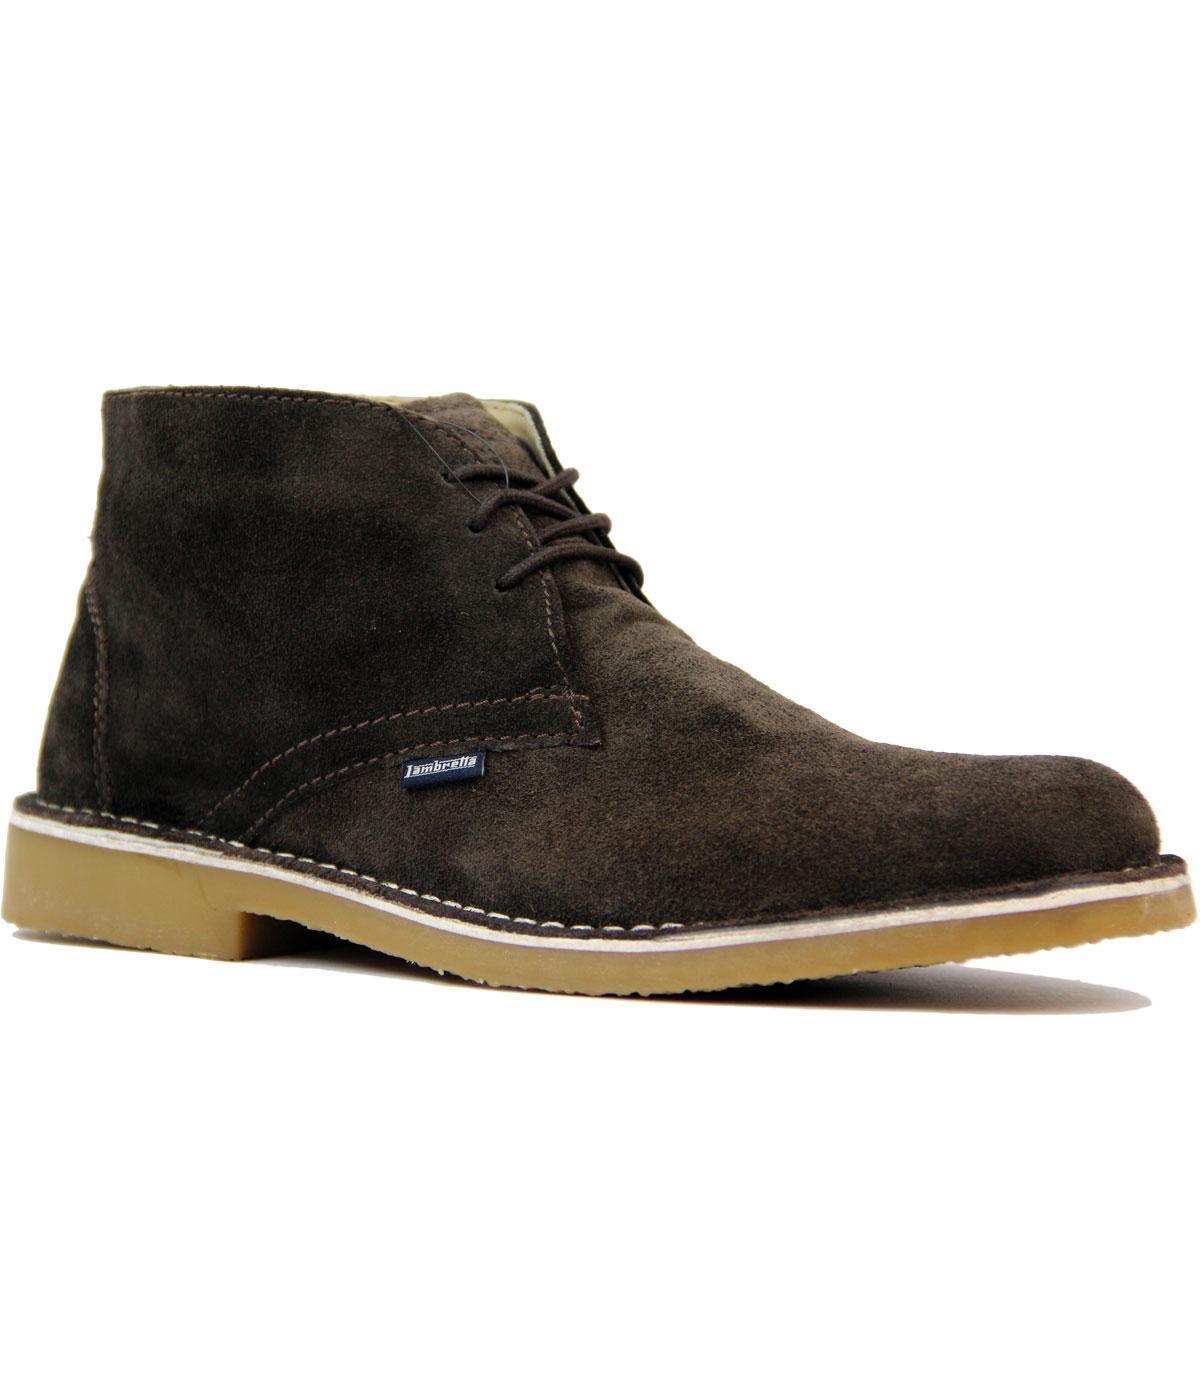 Retro 60s Mod Suede Desert Boots